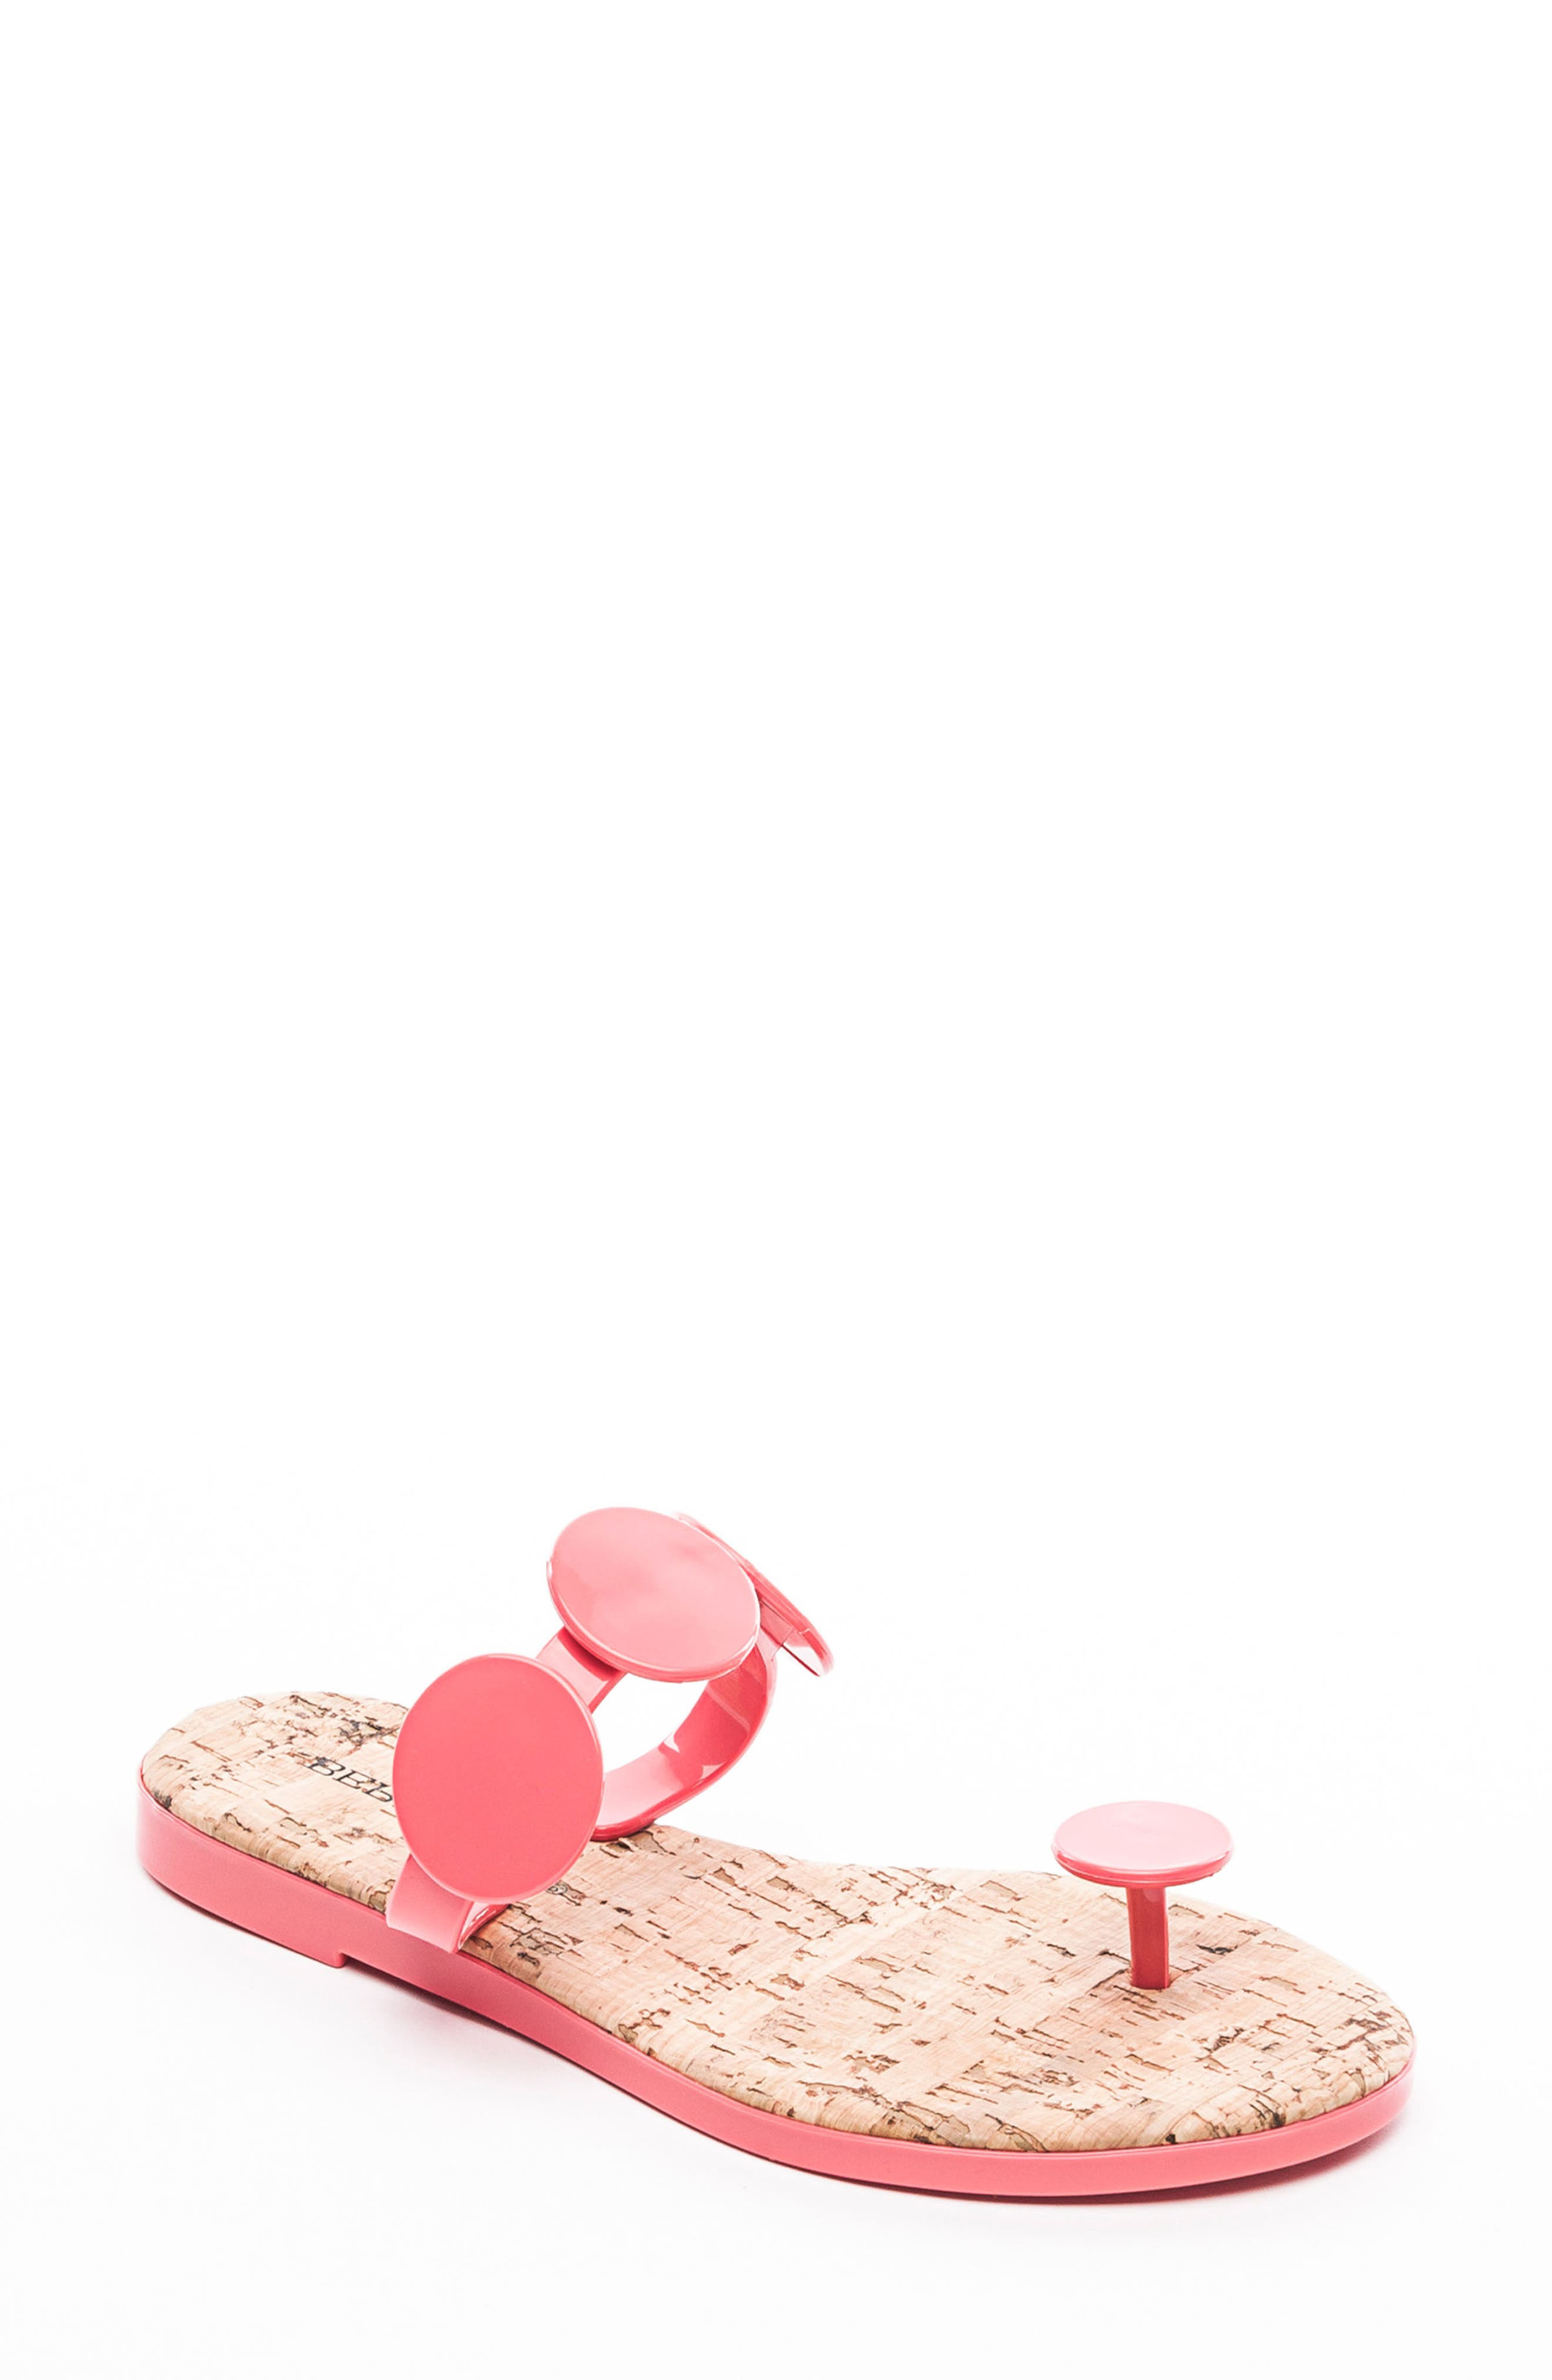 Bernardo New Moon Sandal, Pink